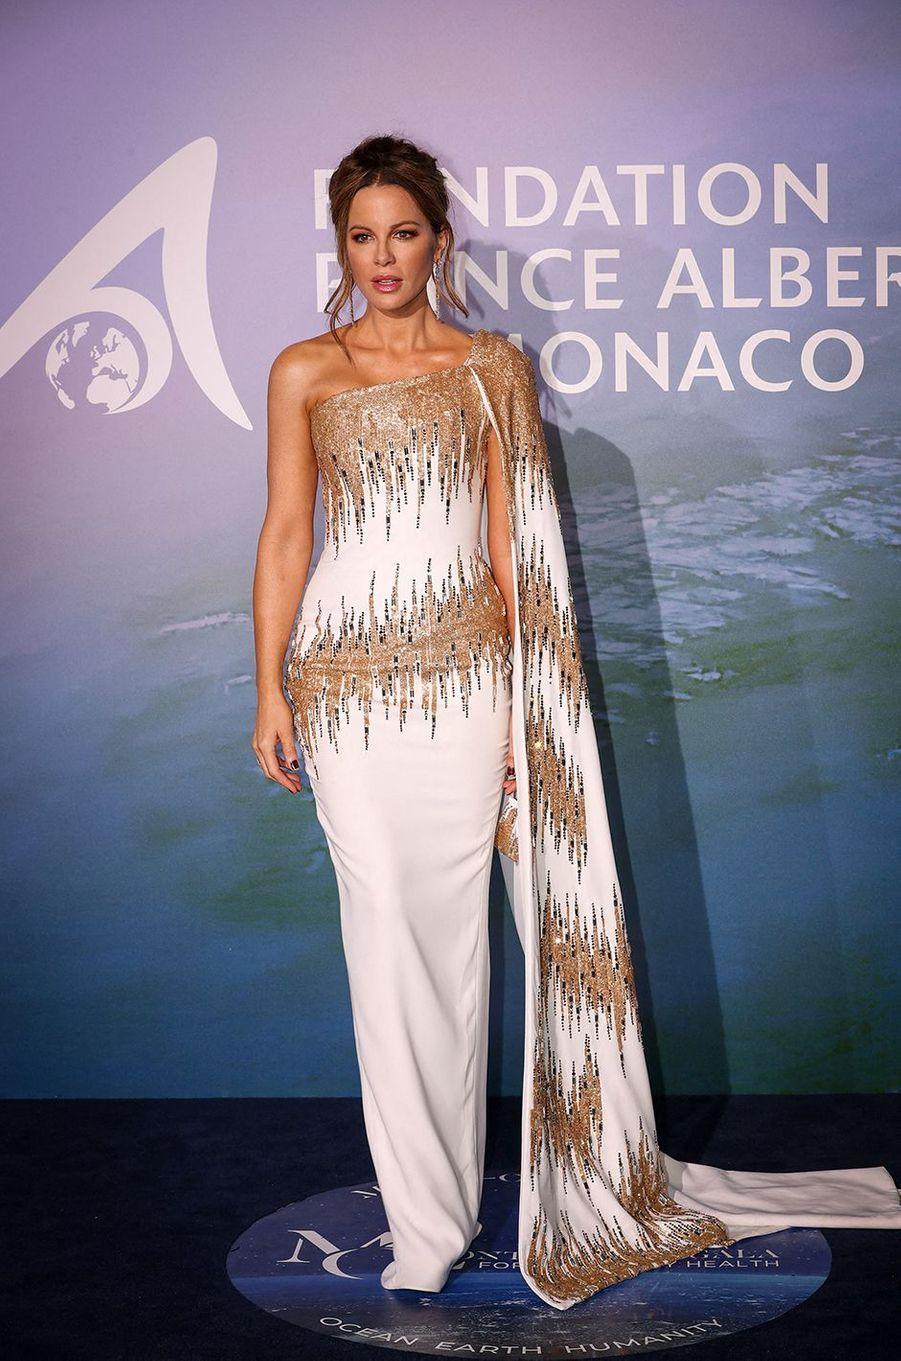 Kate BeckinsaleauMonte-Carlo Gala for Planetary Health organisé par la Fondation Prince Albert II de Monaco le 24 septembre 2020